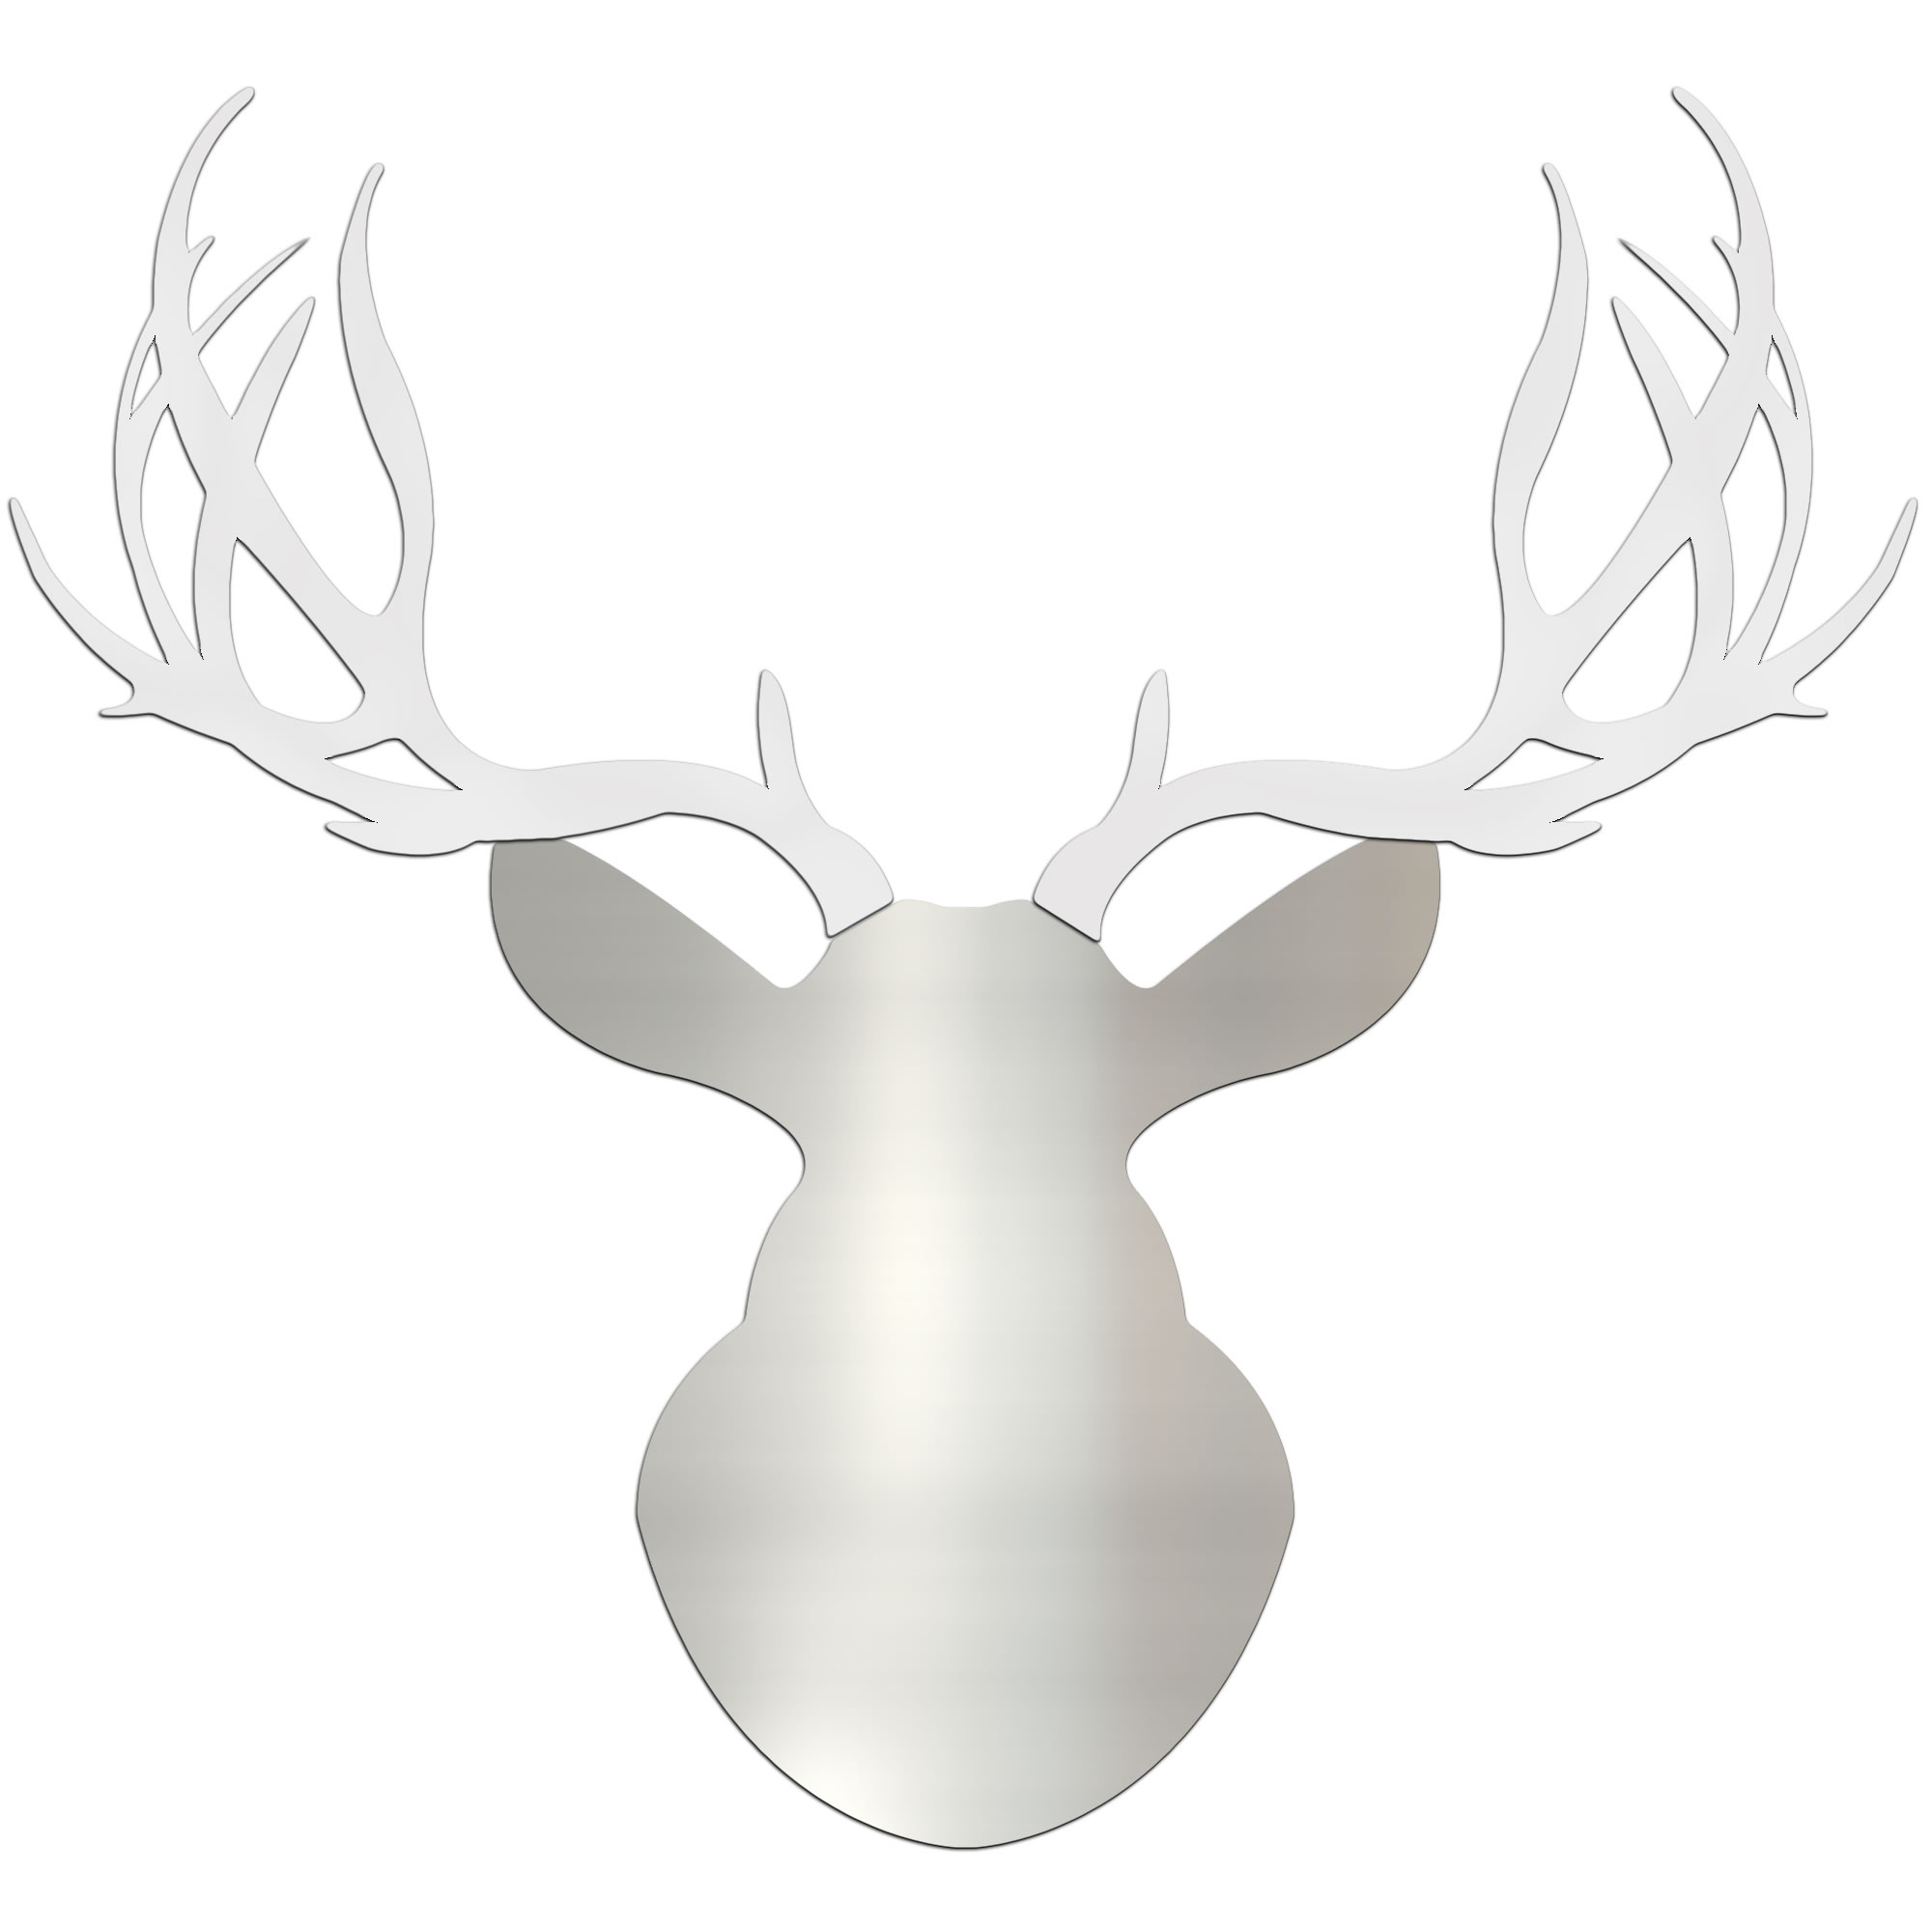 WINTER BUCK - 36x36 in. Silver & White Deer Cut-Out